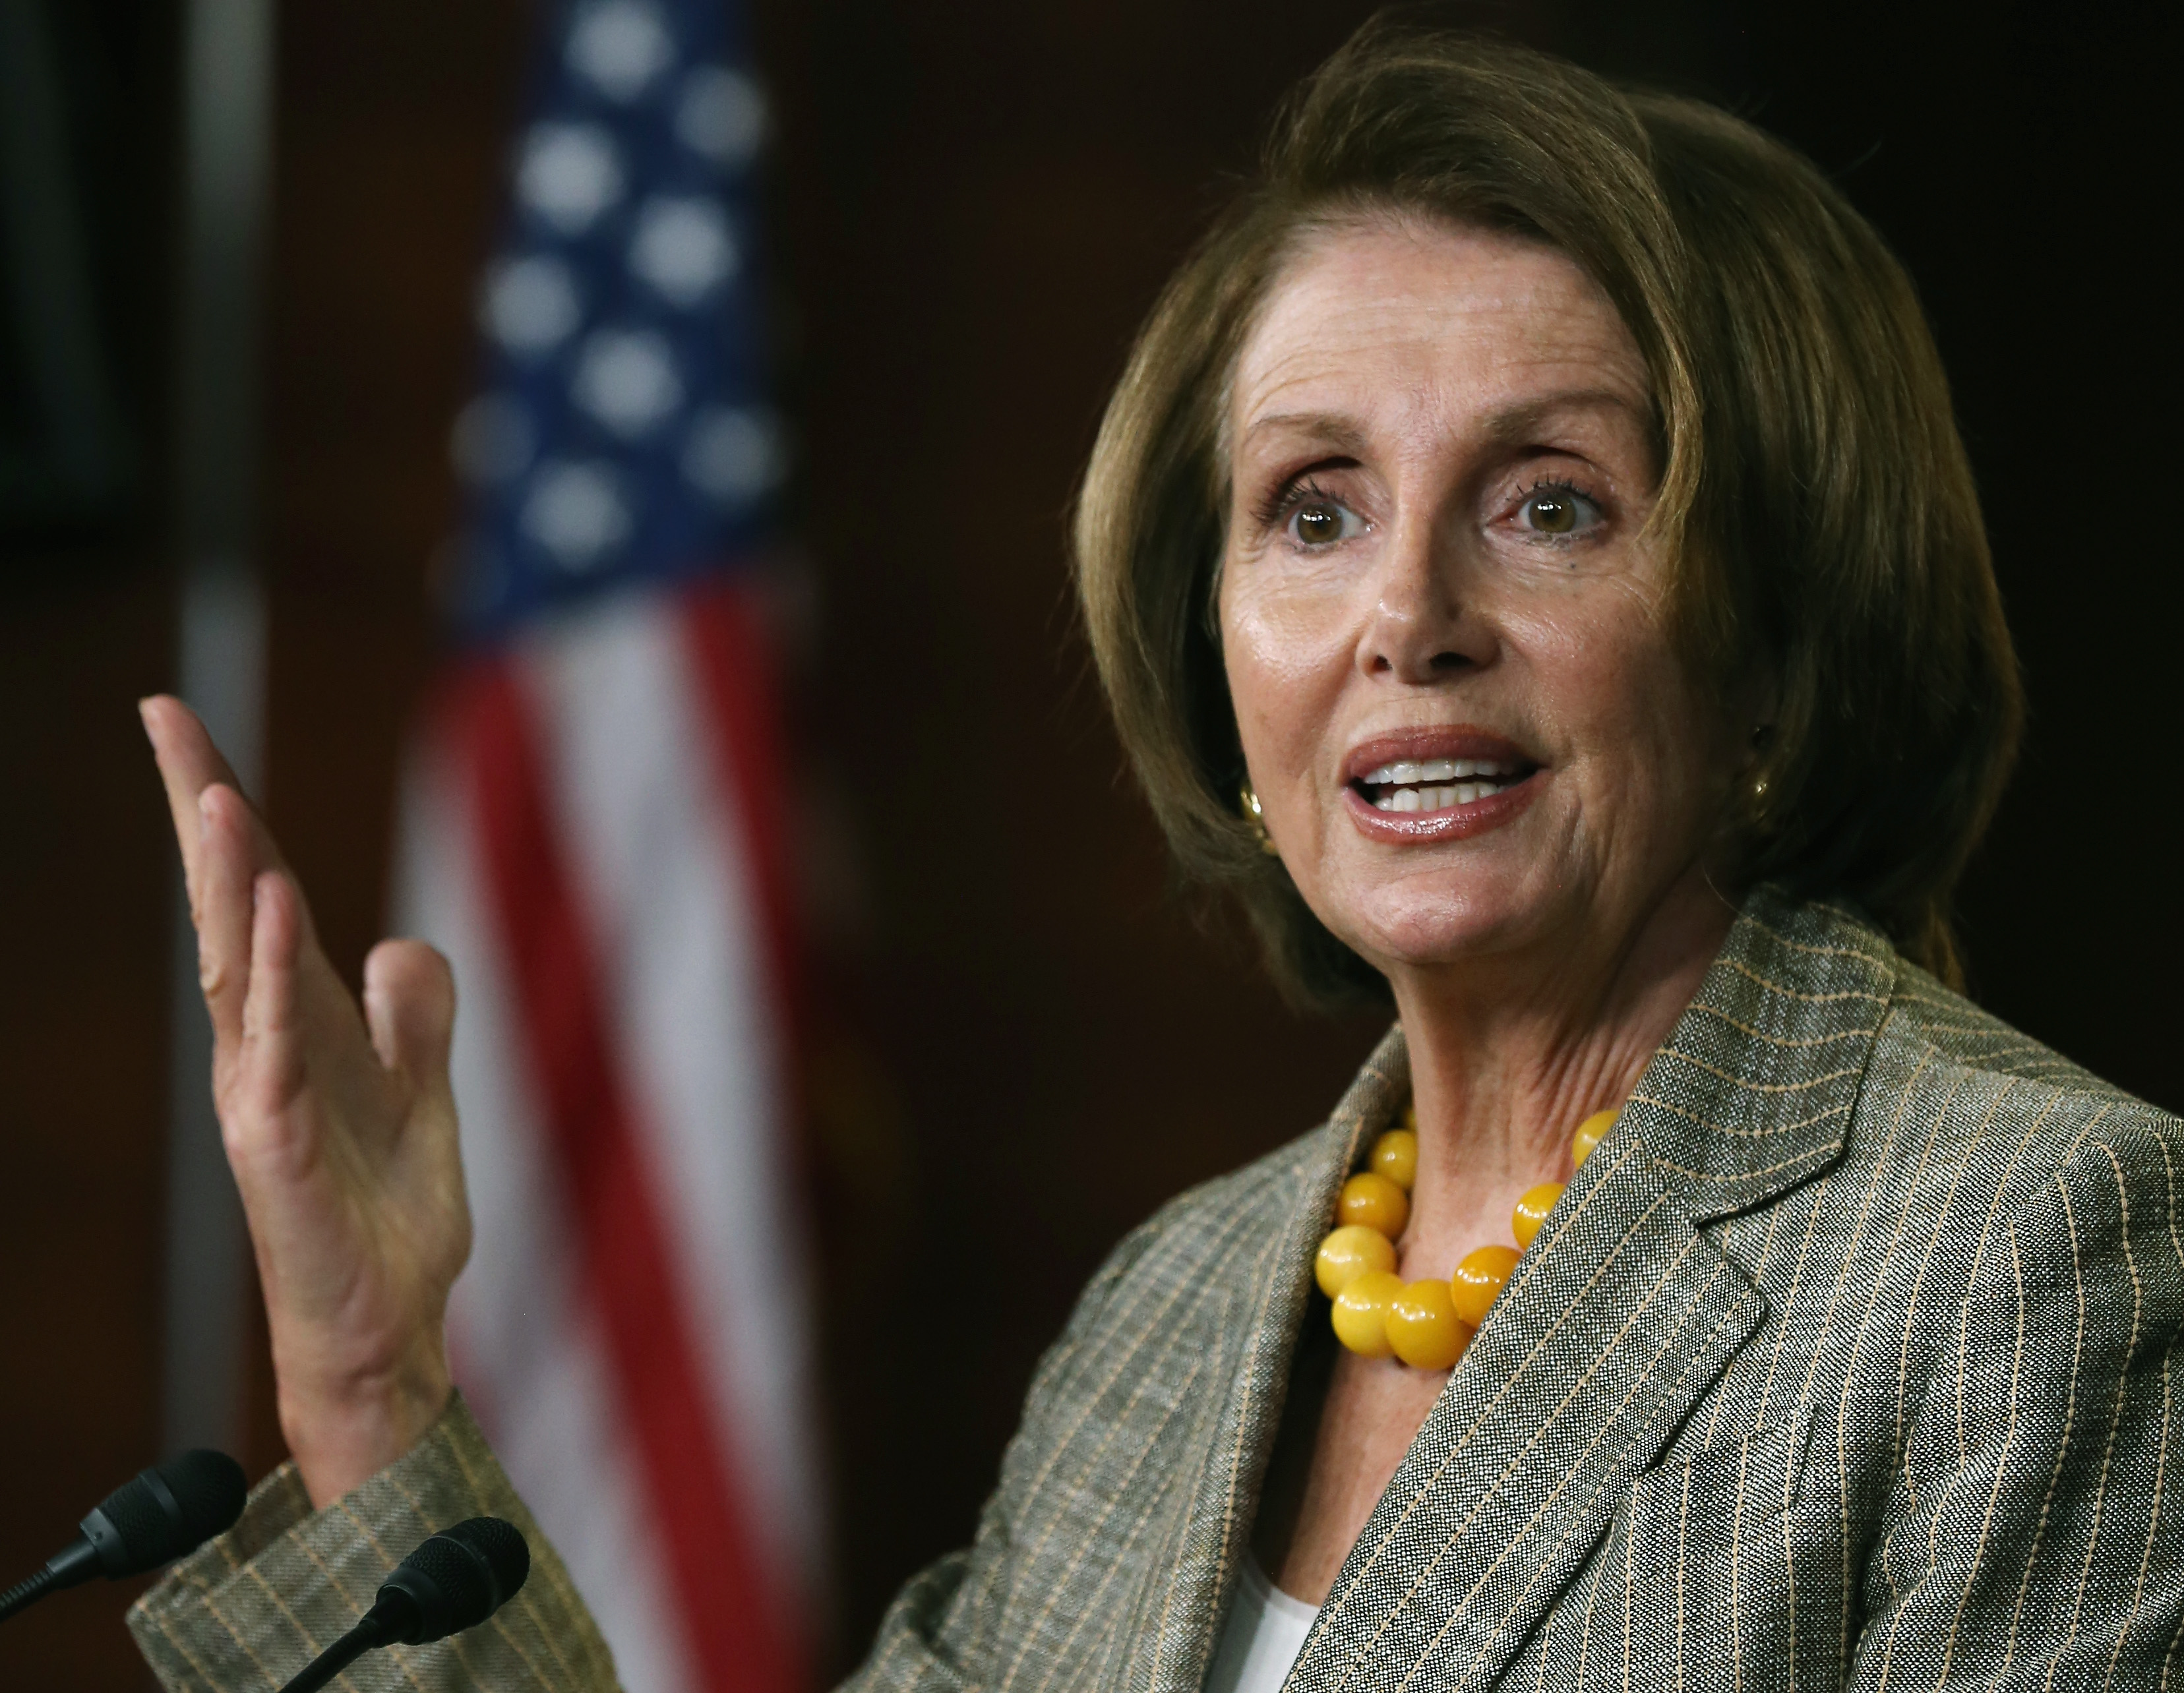 Nancy Pelosi speaks at the U.S. Capitol October 1, 2014 in Washington, D.C.